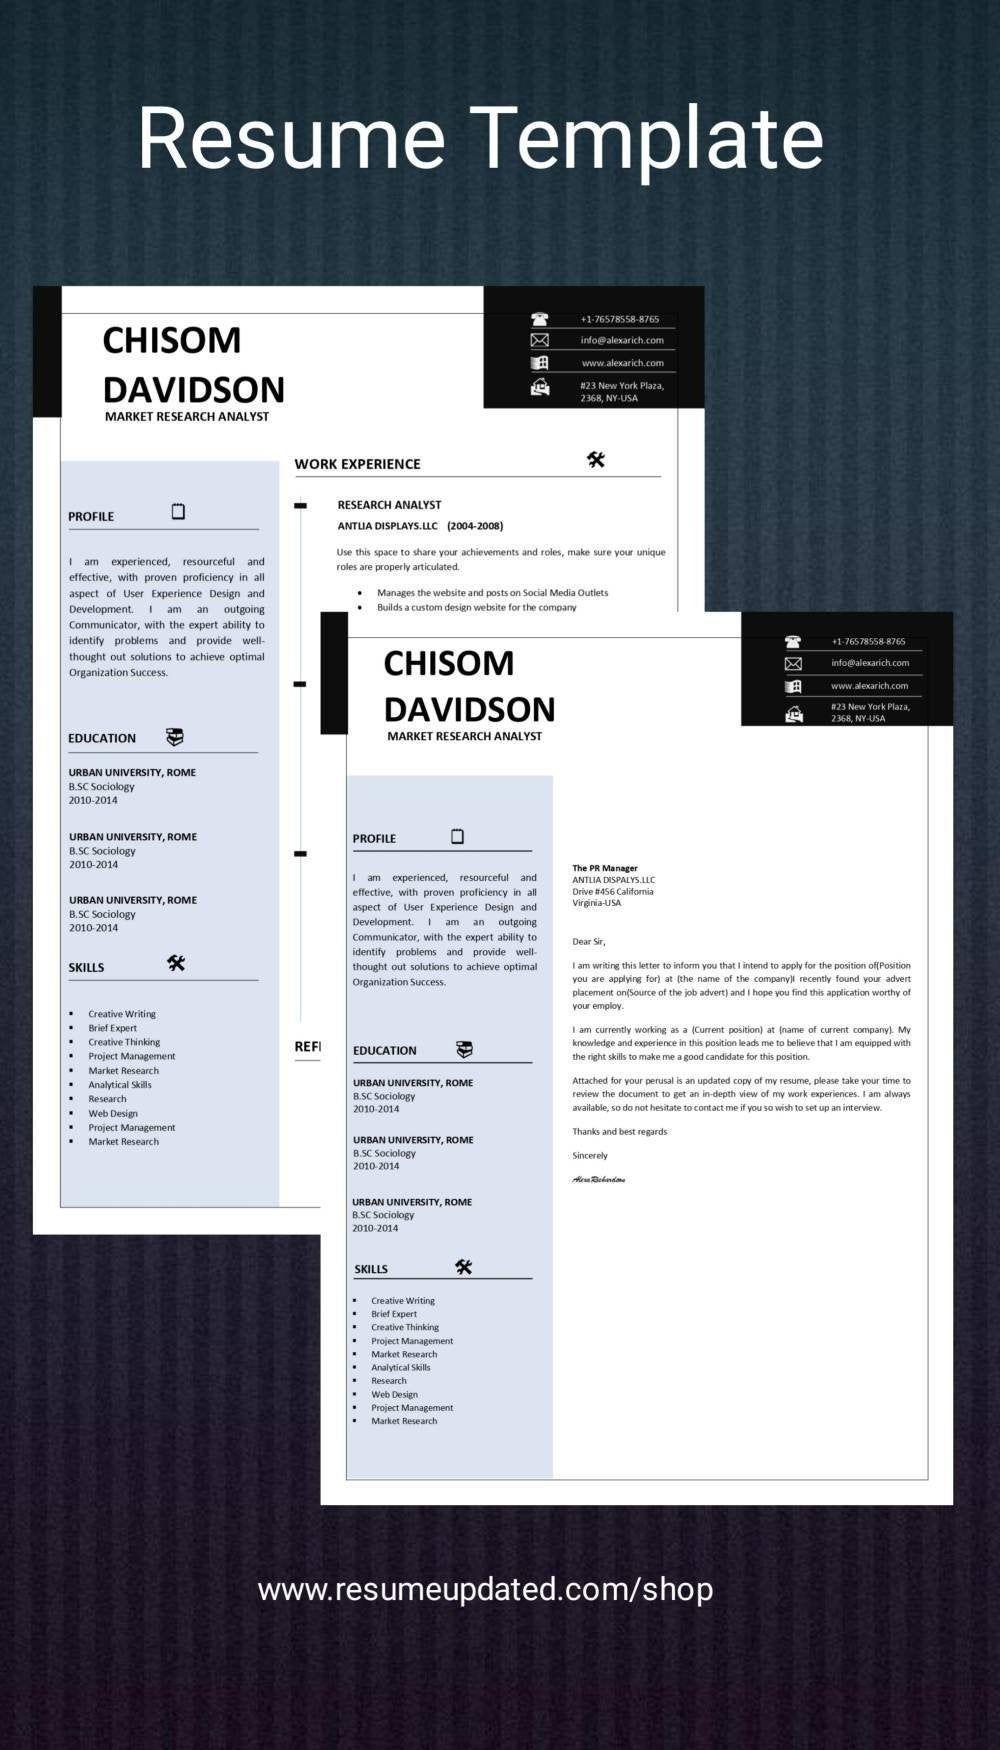 Resume Templatecv Word Professional Resume Minimalist Etsy In 2021 Cv Words Resume Template Professional Minimalist Resume